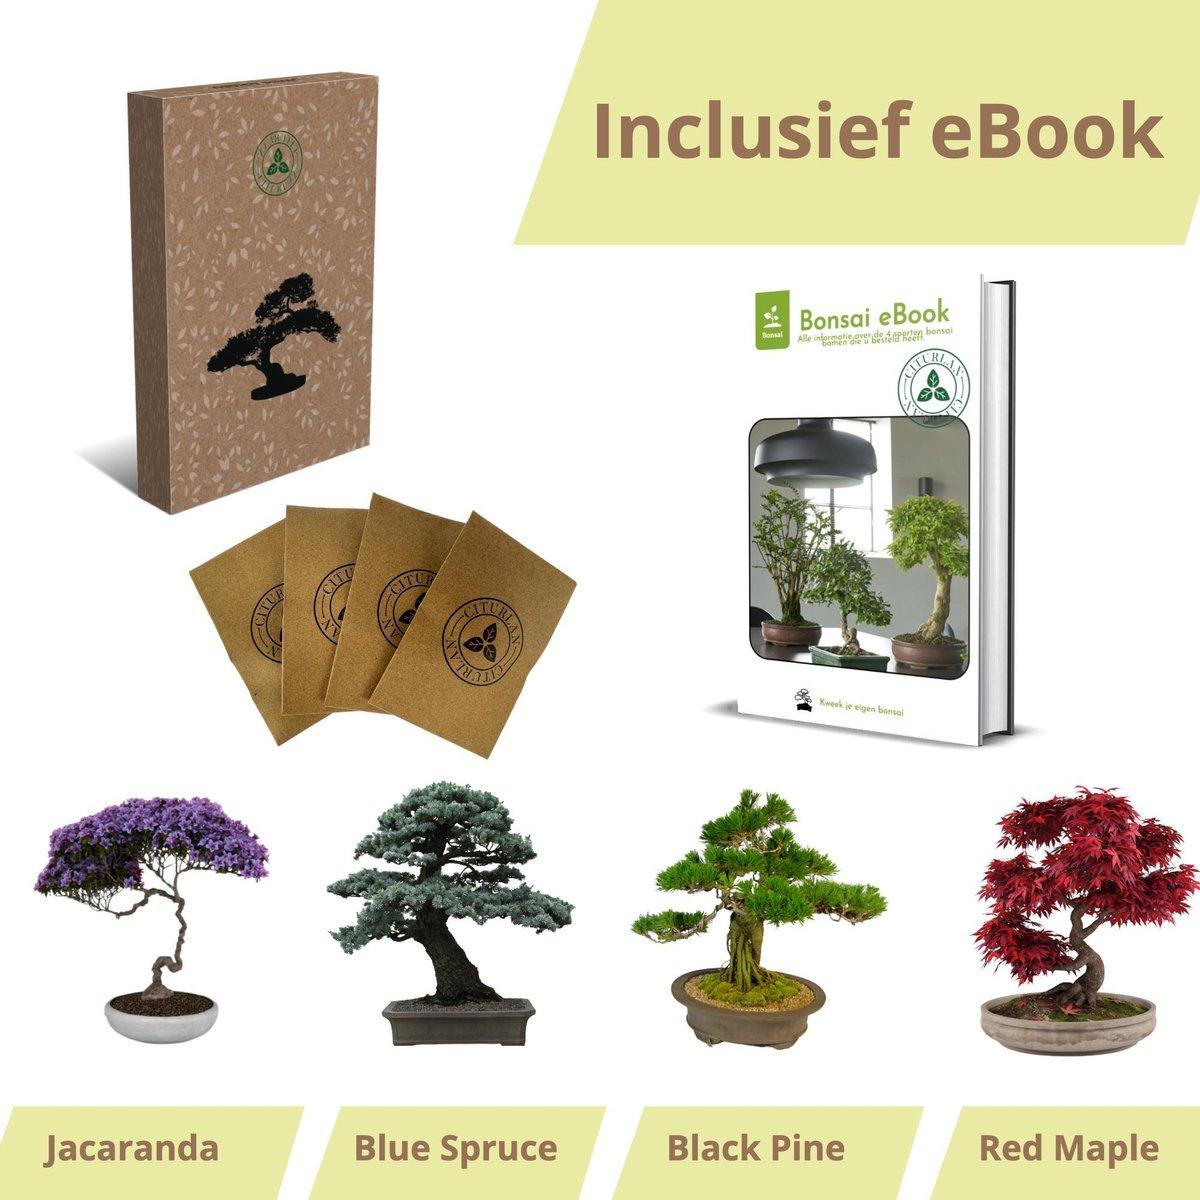 Bonsai zaden 4 soorten - Bonsai boompje - Kamerplanten - Vaderdag - Incl. E-book